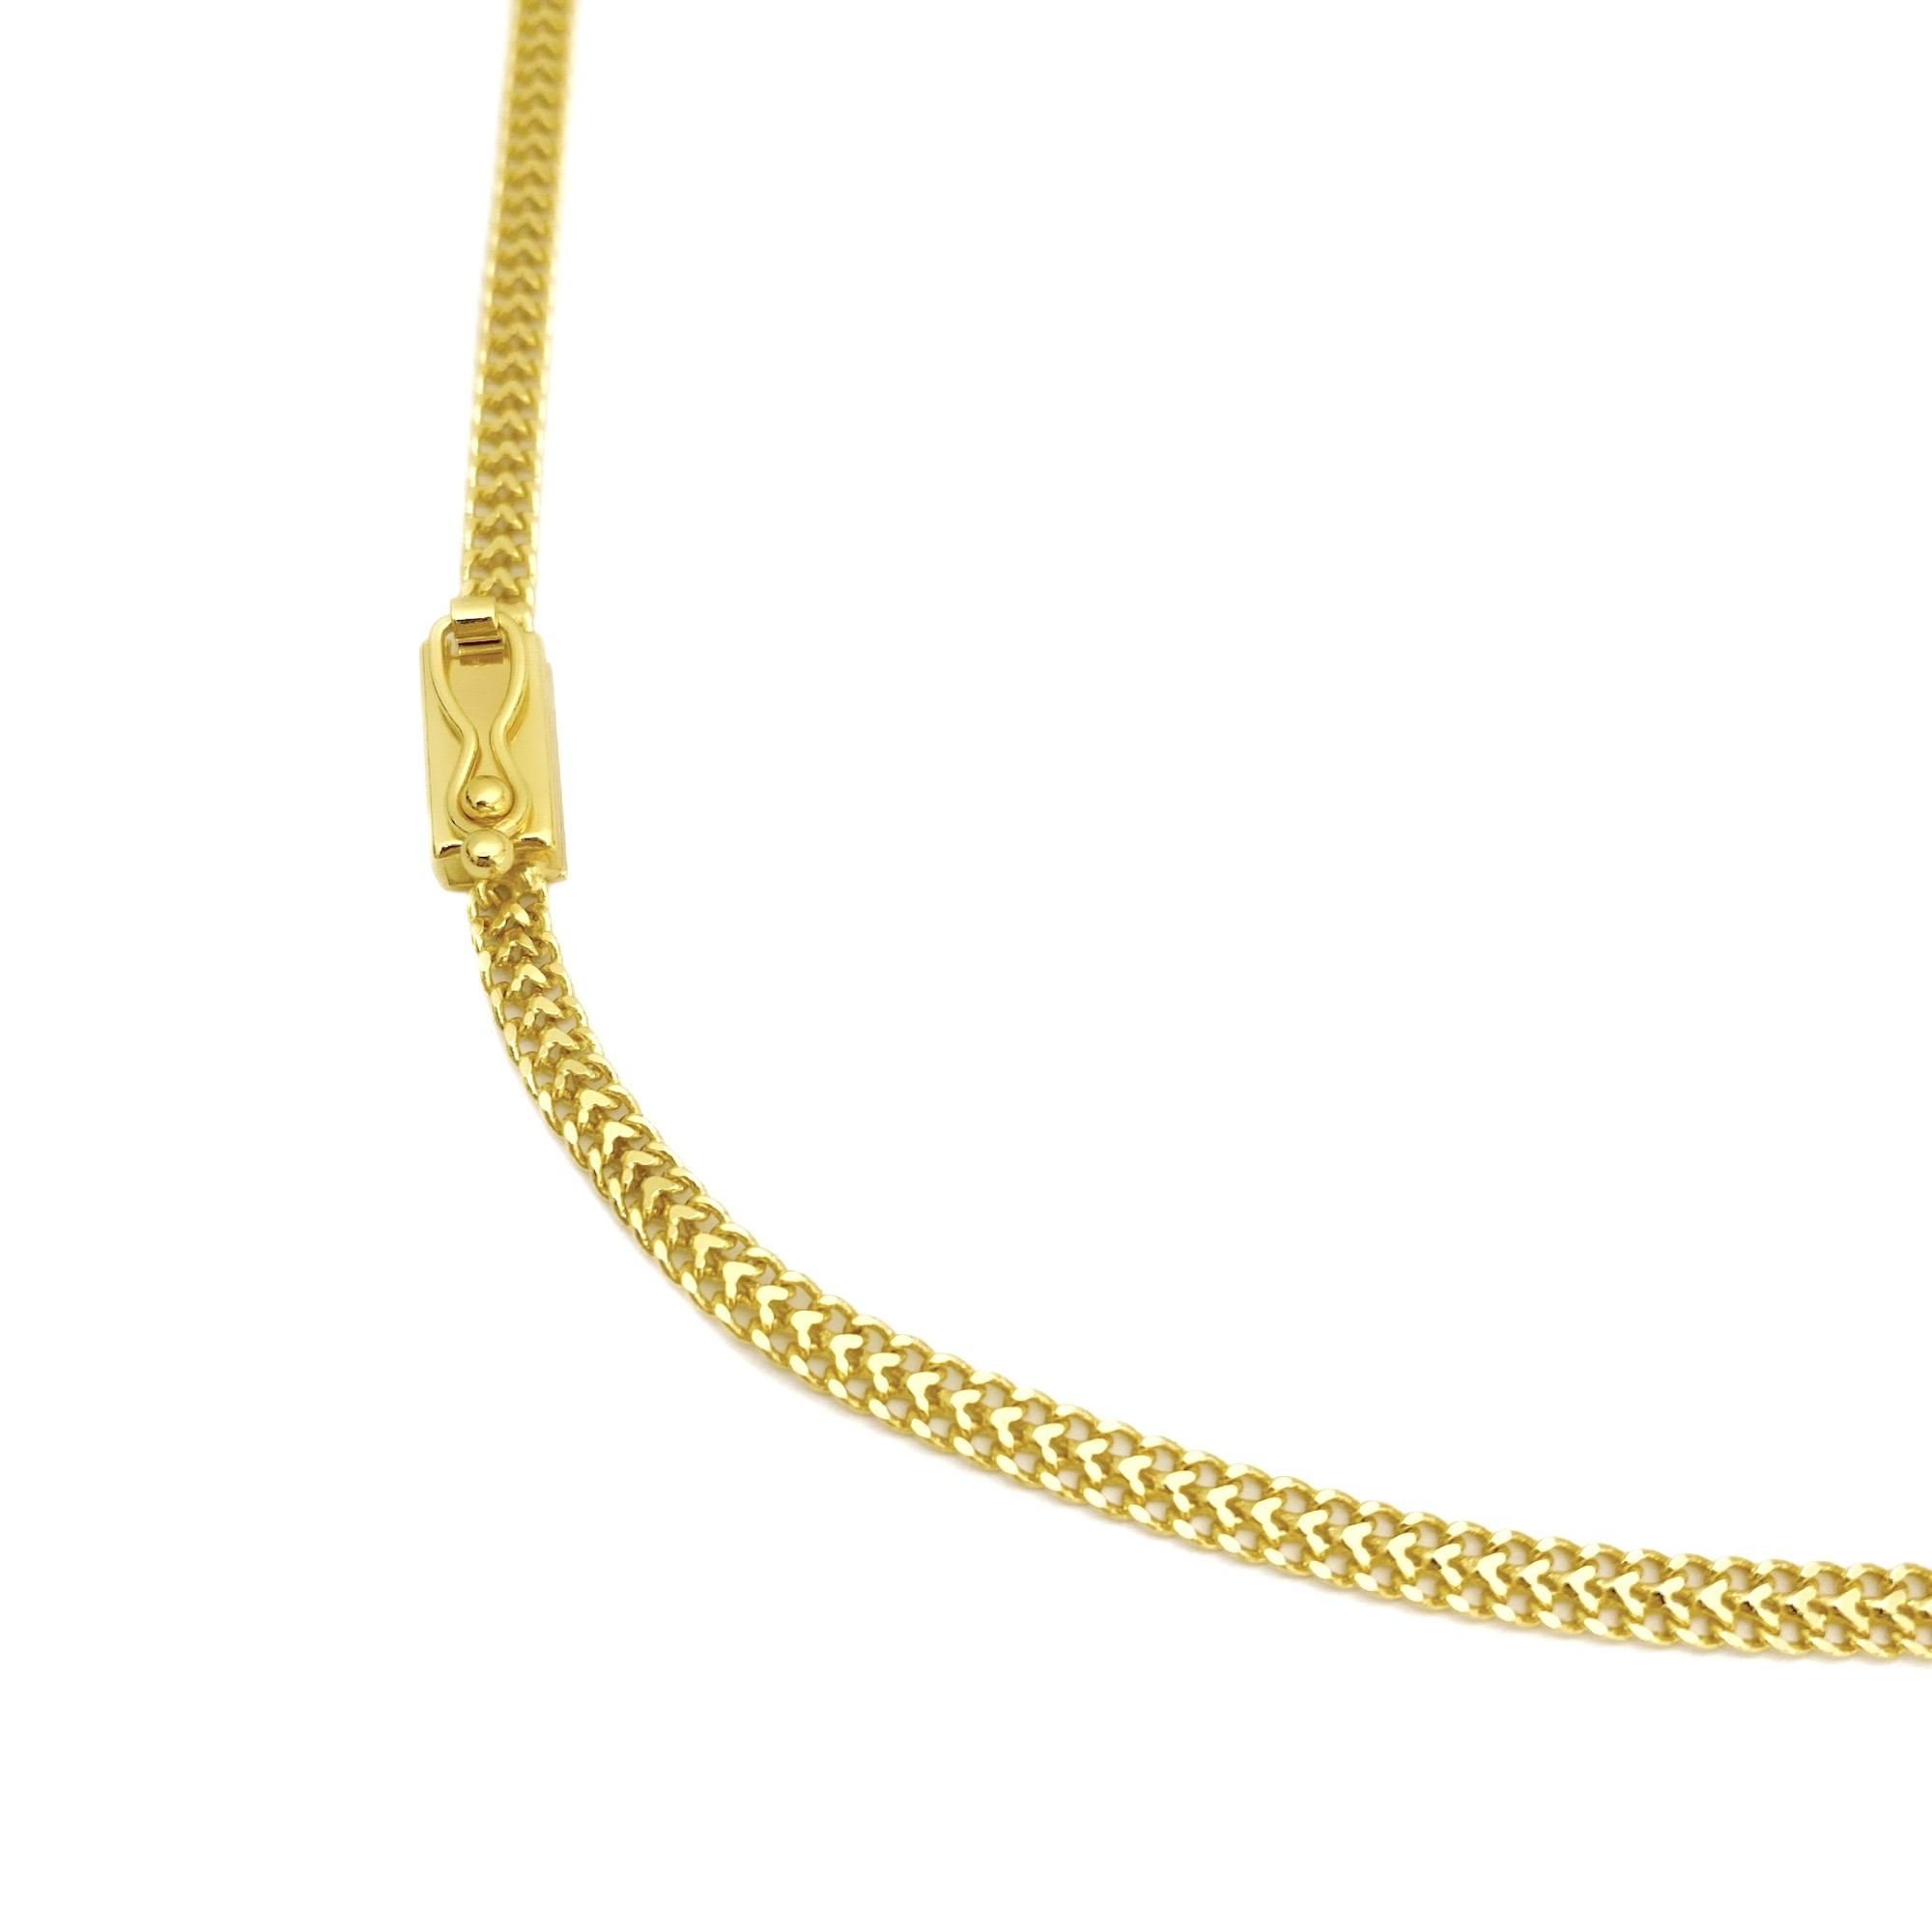 Corrente Grumet Union 3,3mm 70cm (9,2g) (Fecho Gaveta) (Banho Ouro 24k)